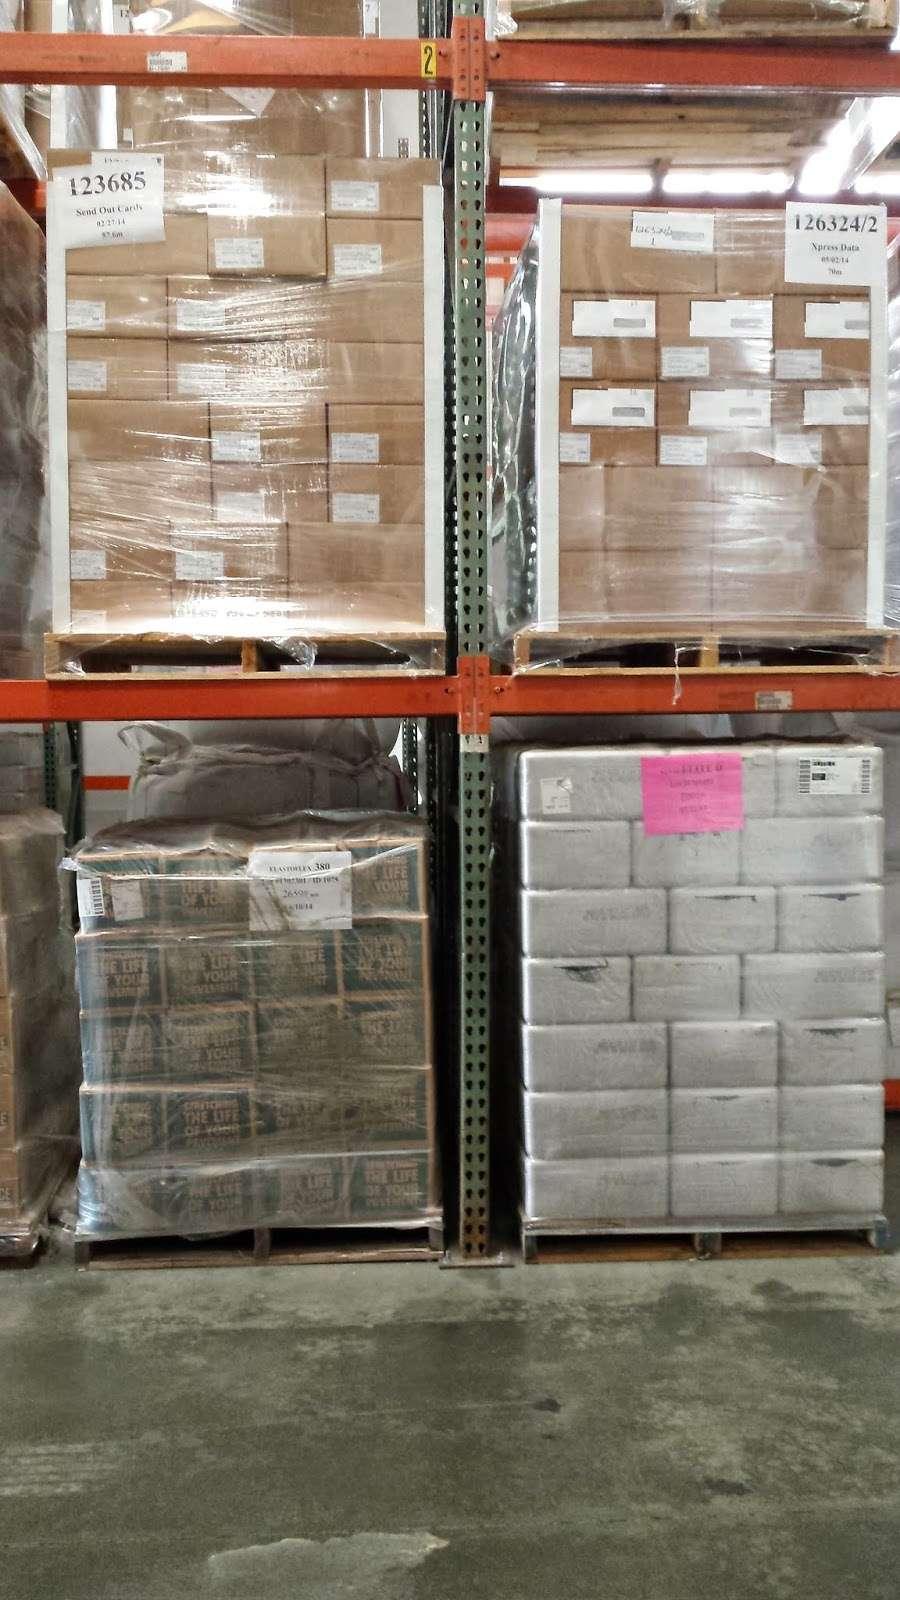 AJM Delivery Service Inc - moving company  | Photo 2 of 4 | Address: 3778 S Milliken Ave Unit D, Eastvale, CA 91752, USA | Phone: (951) 685-7886